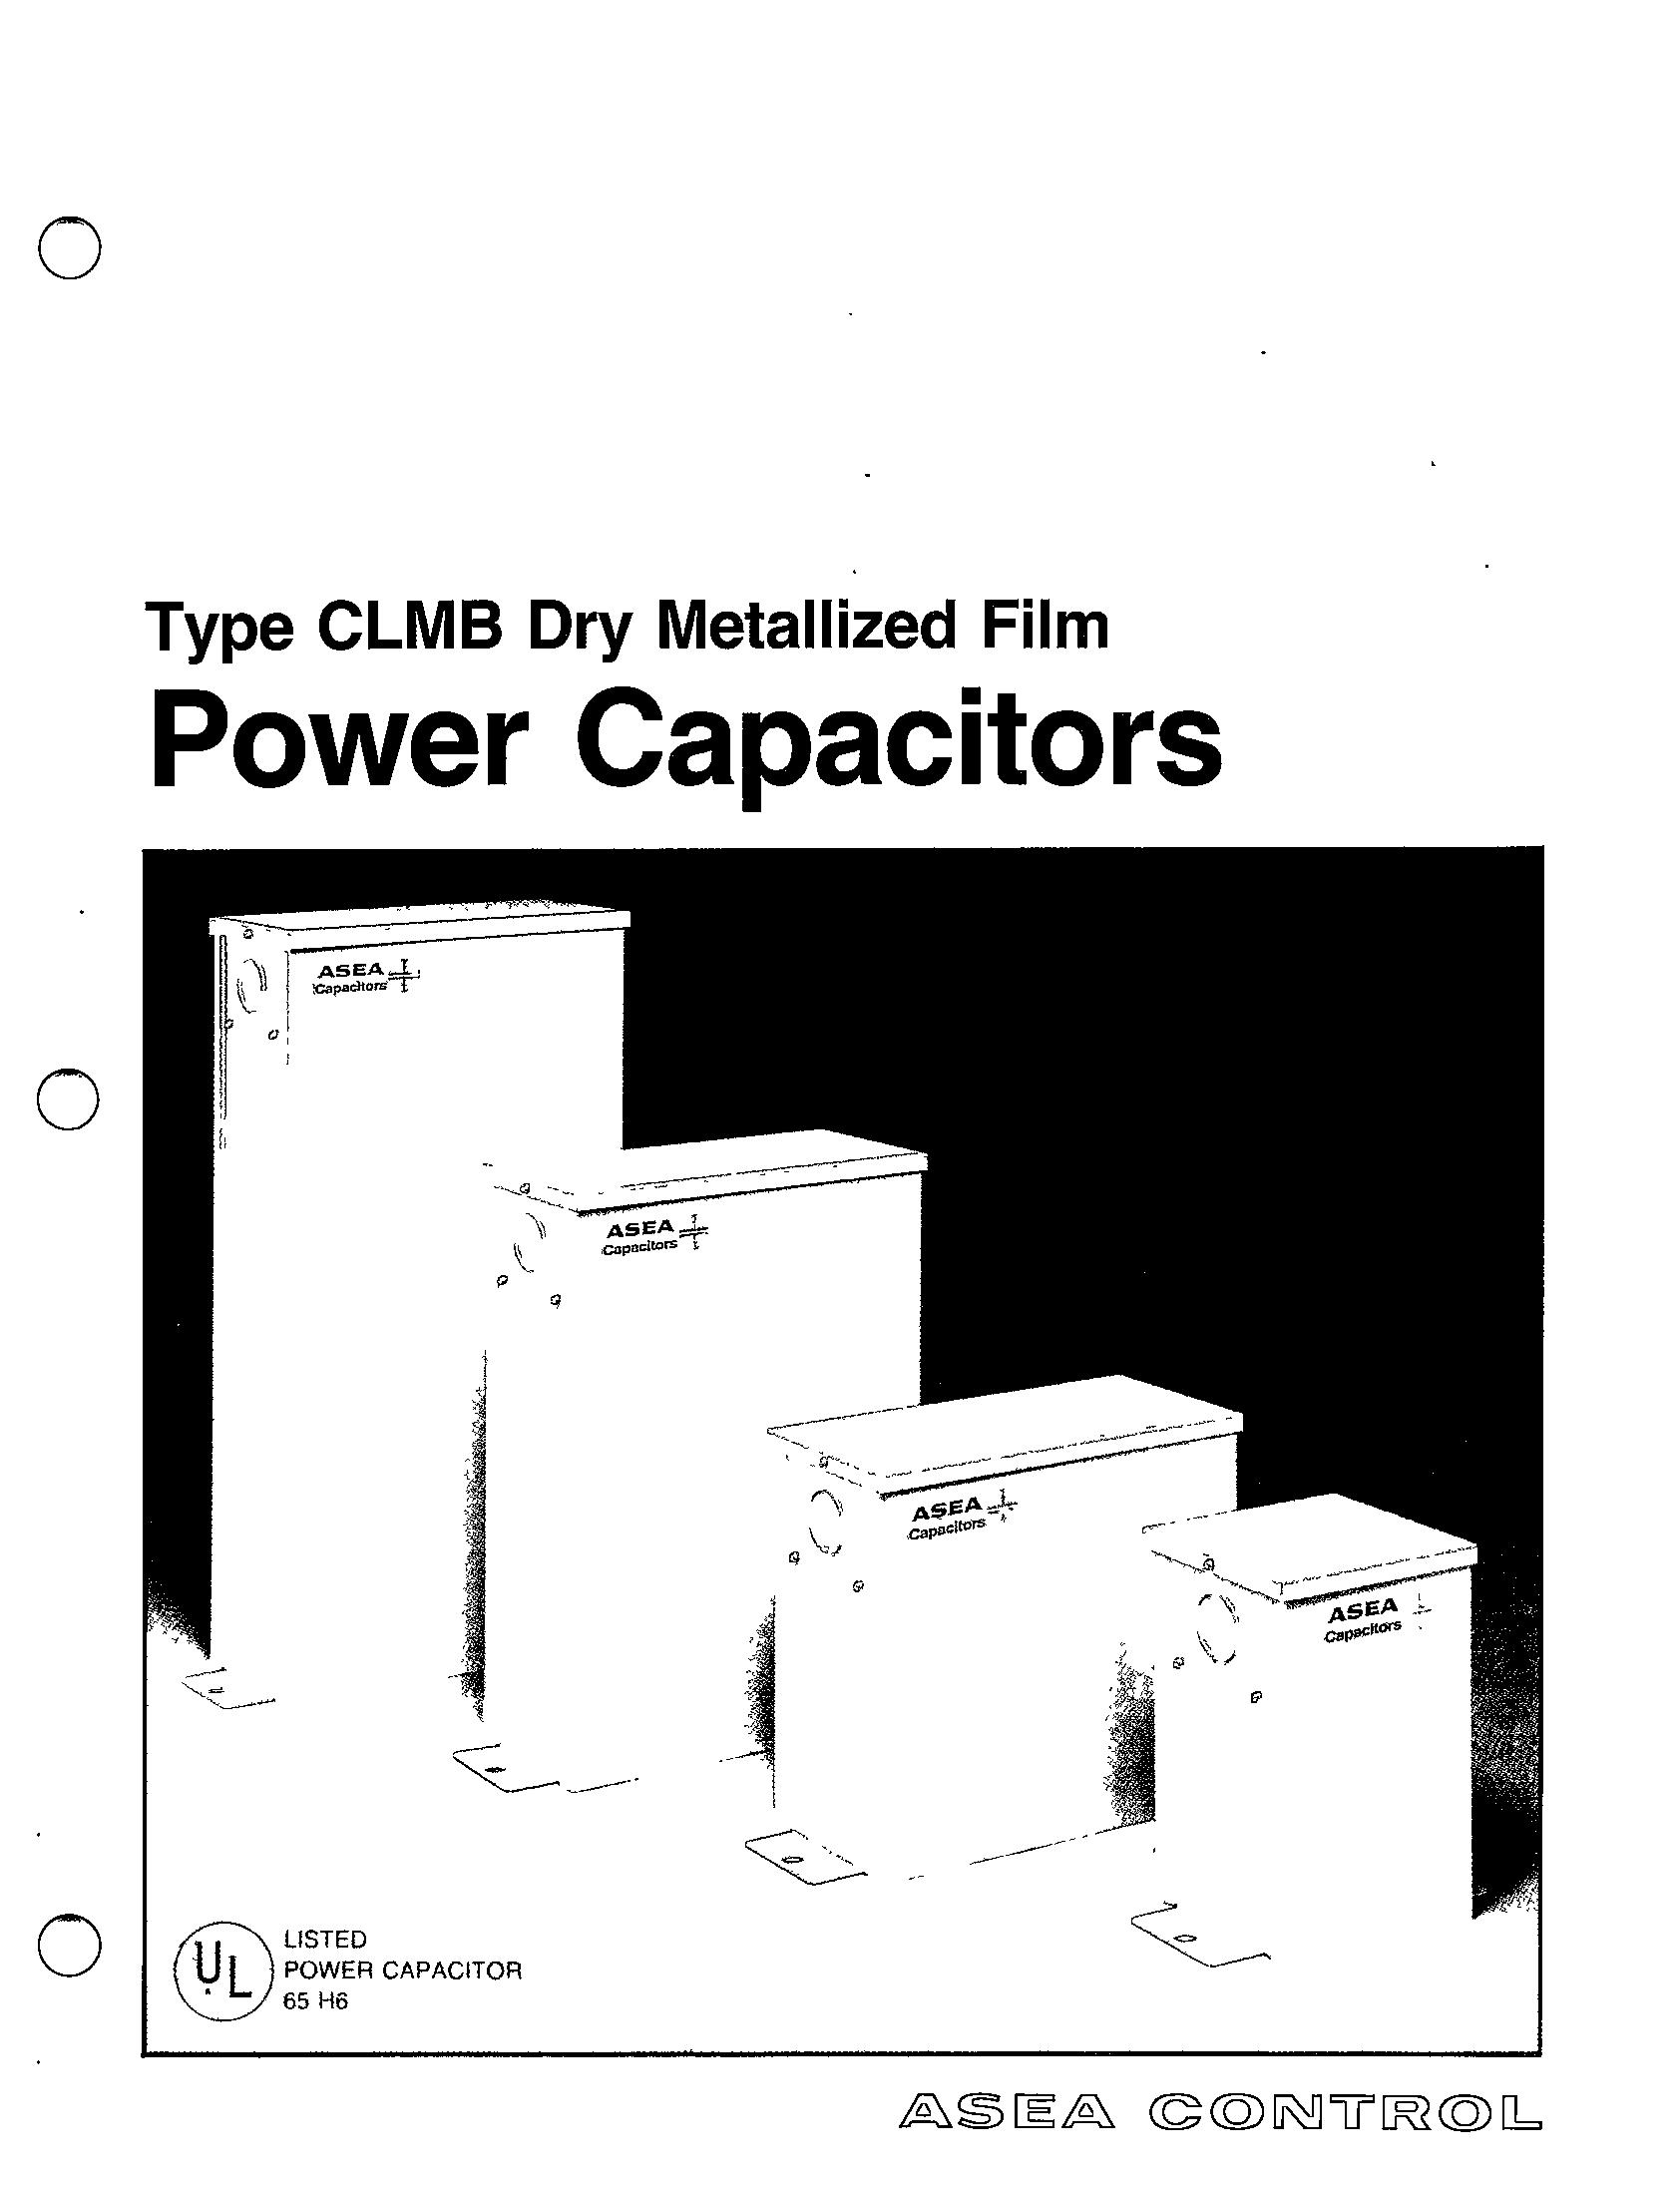 Type Clmb Dry Metallized Film Power Capacitors Manual